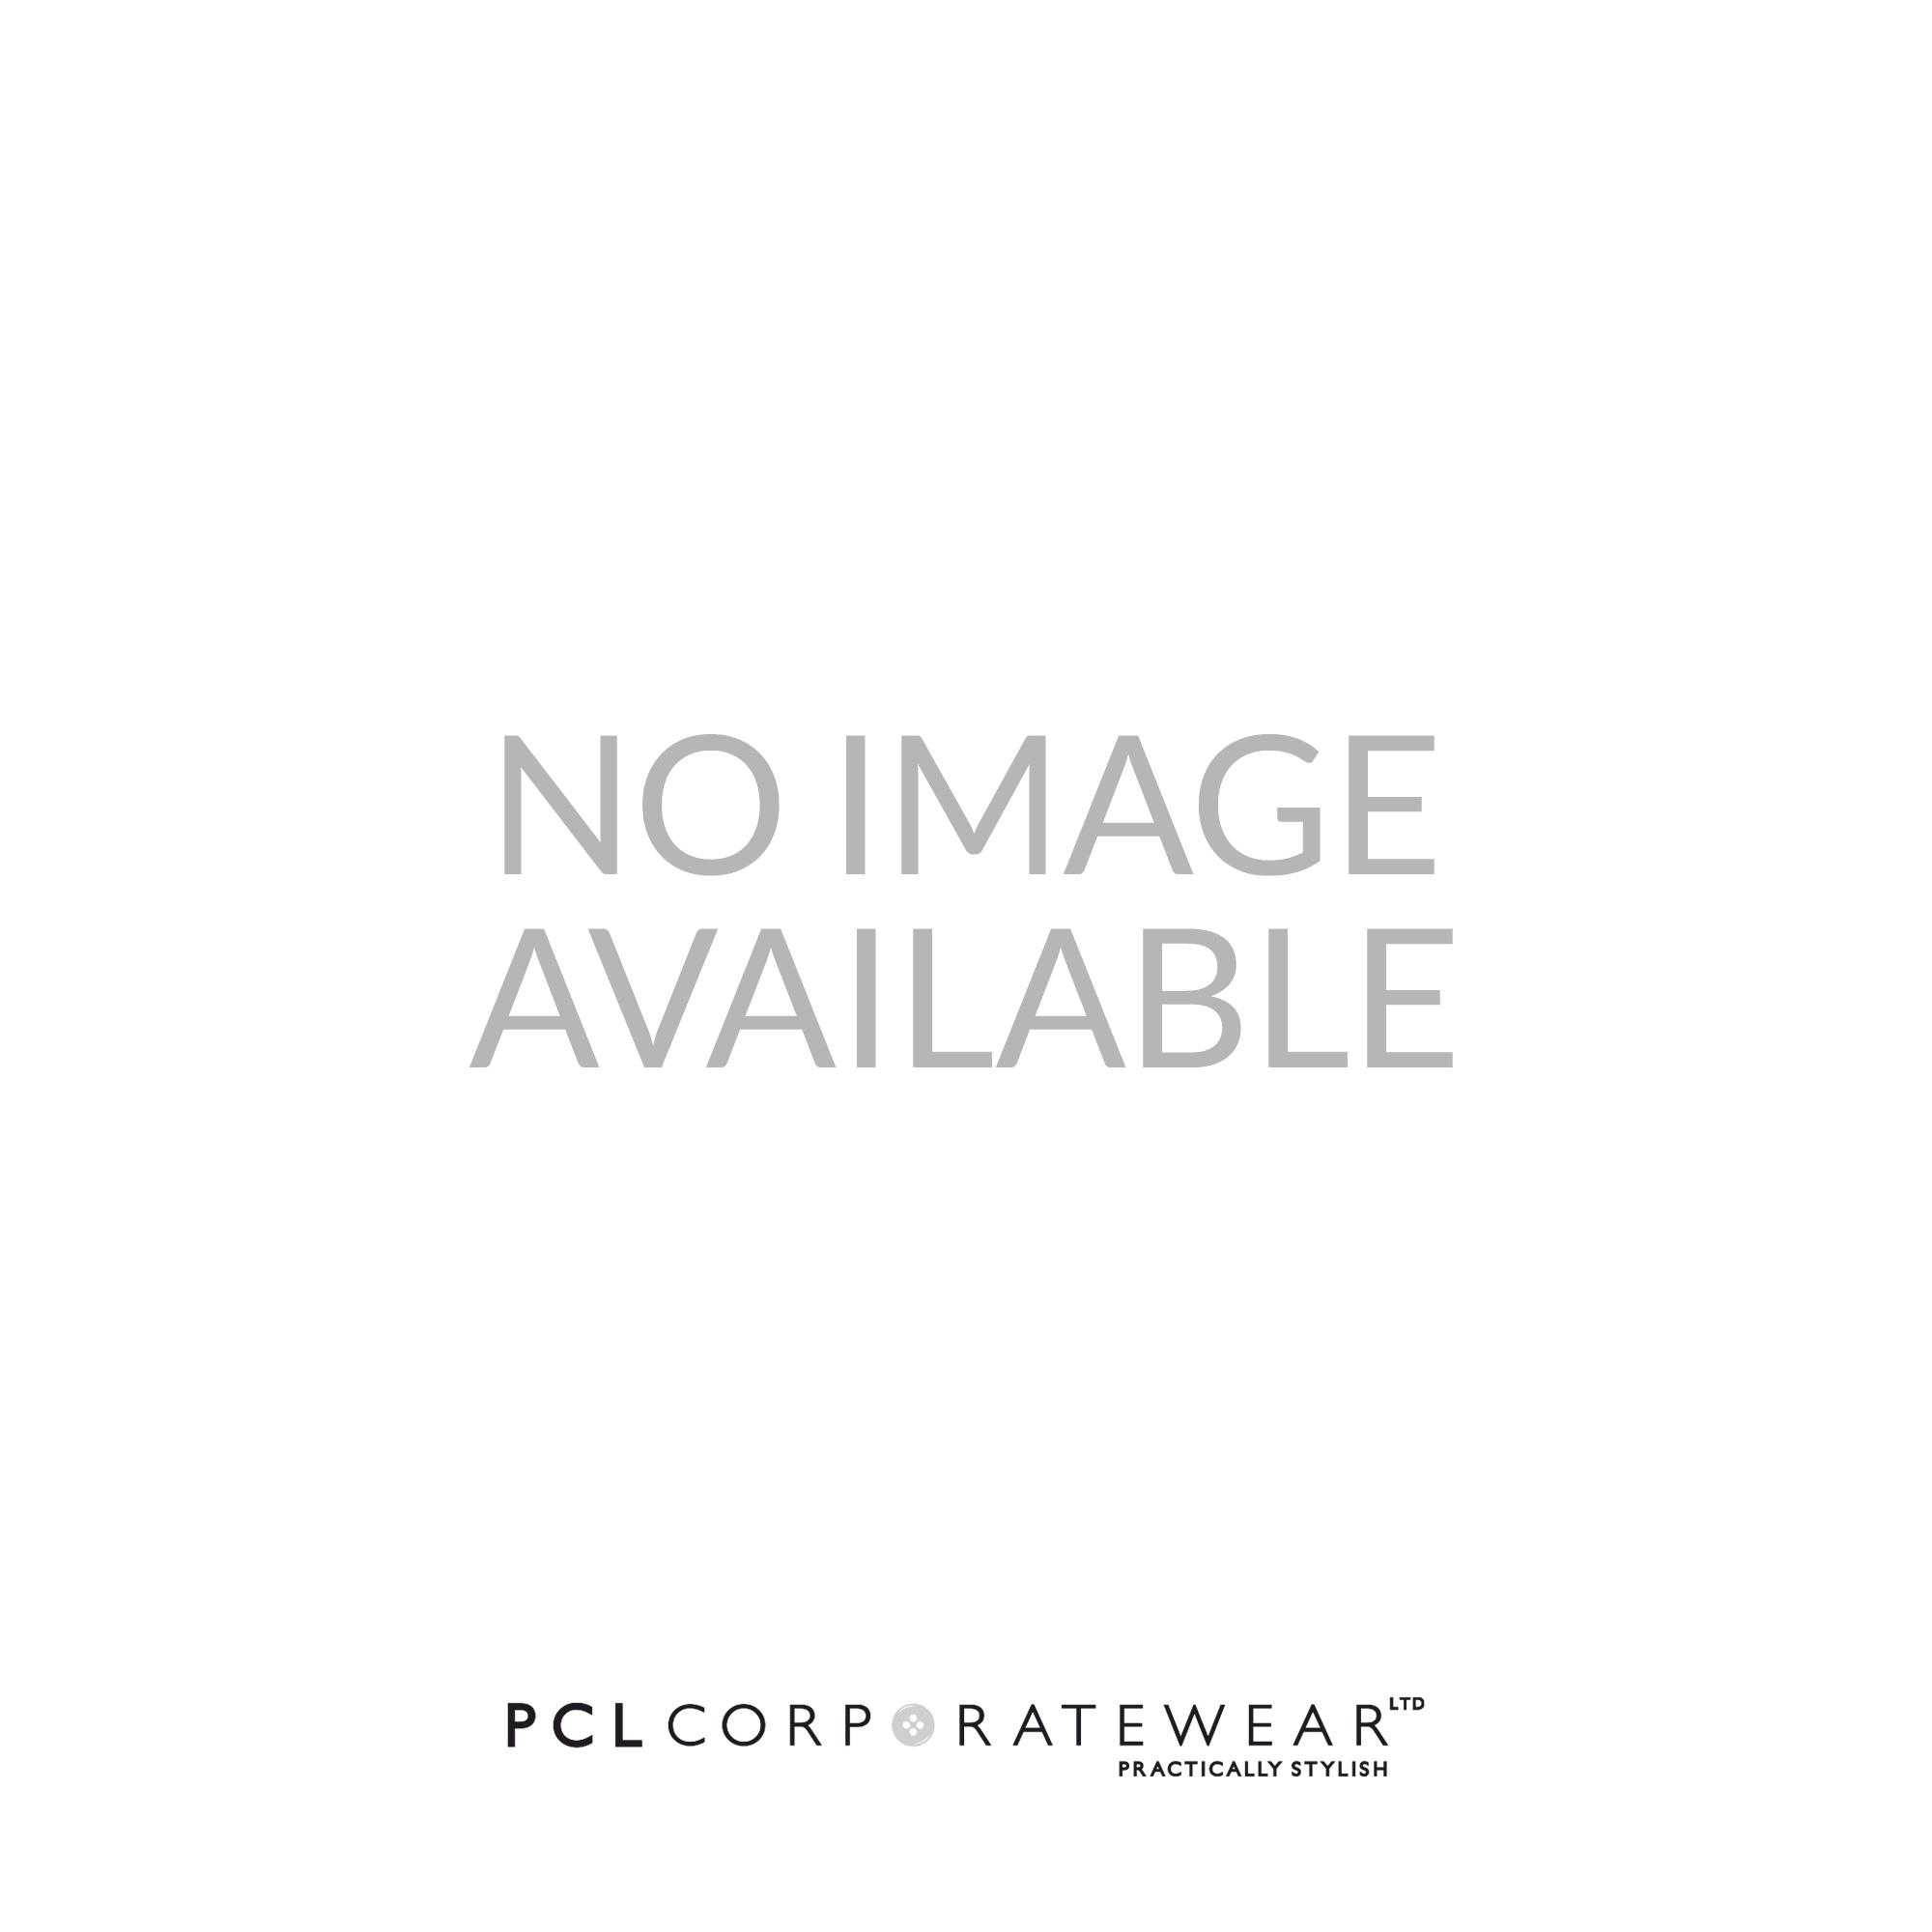 Beechfield 5 Panel Snapback Rapper Cap - BB610 - PCL Corporatewear Ltd 4f2ab1c5c36